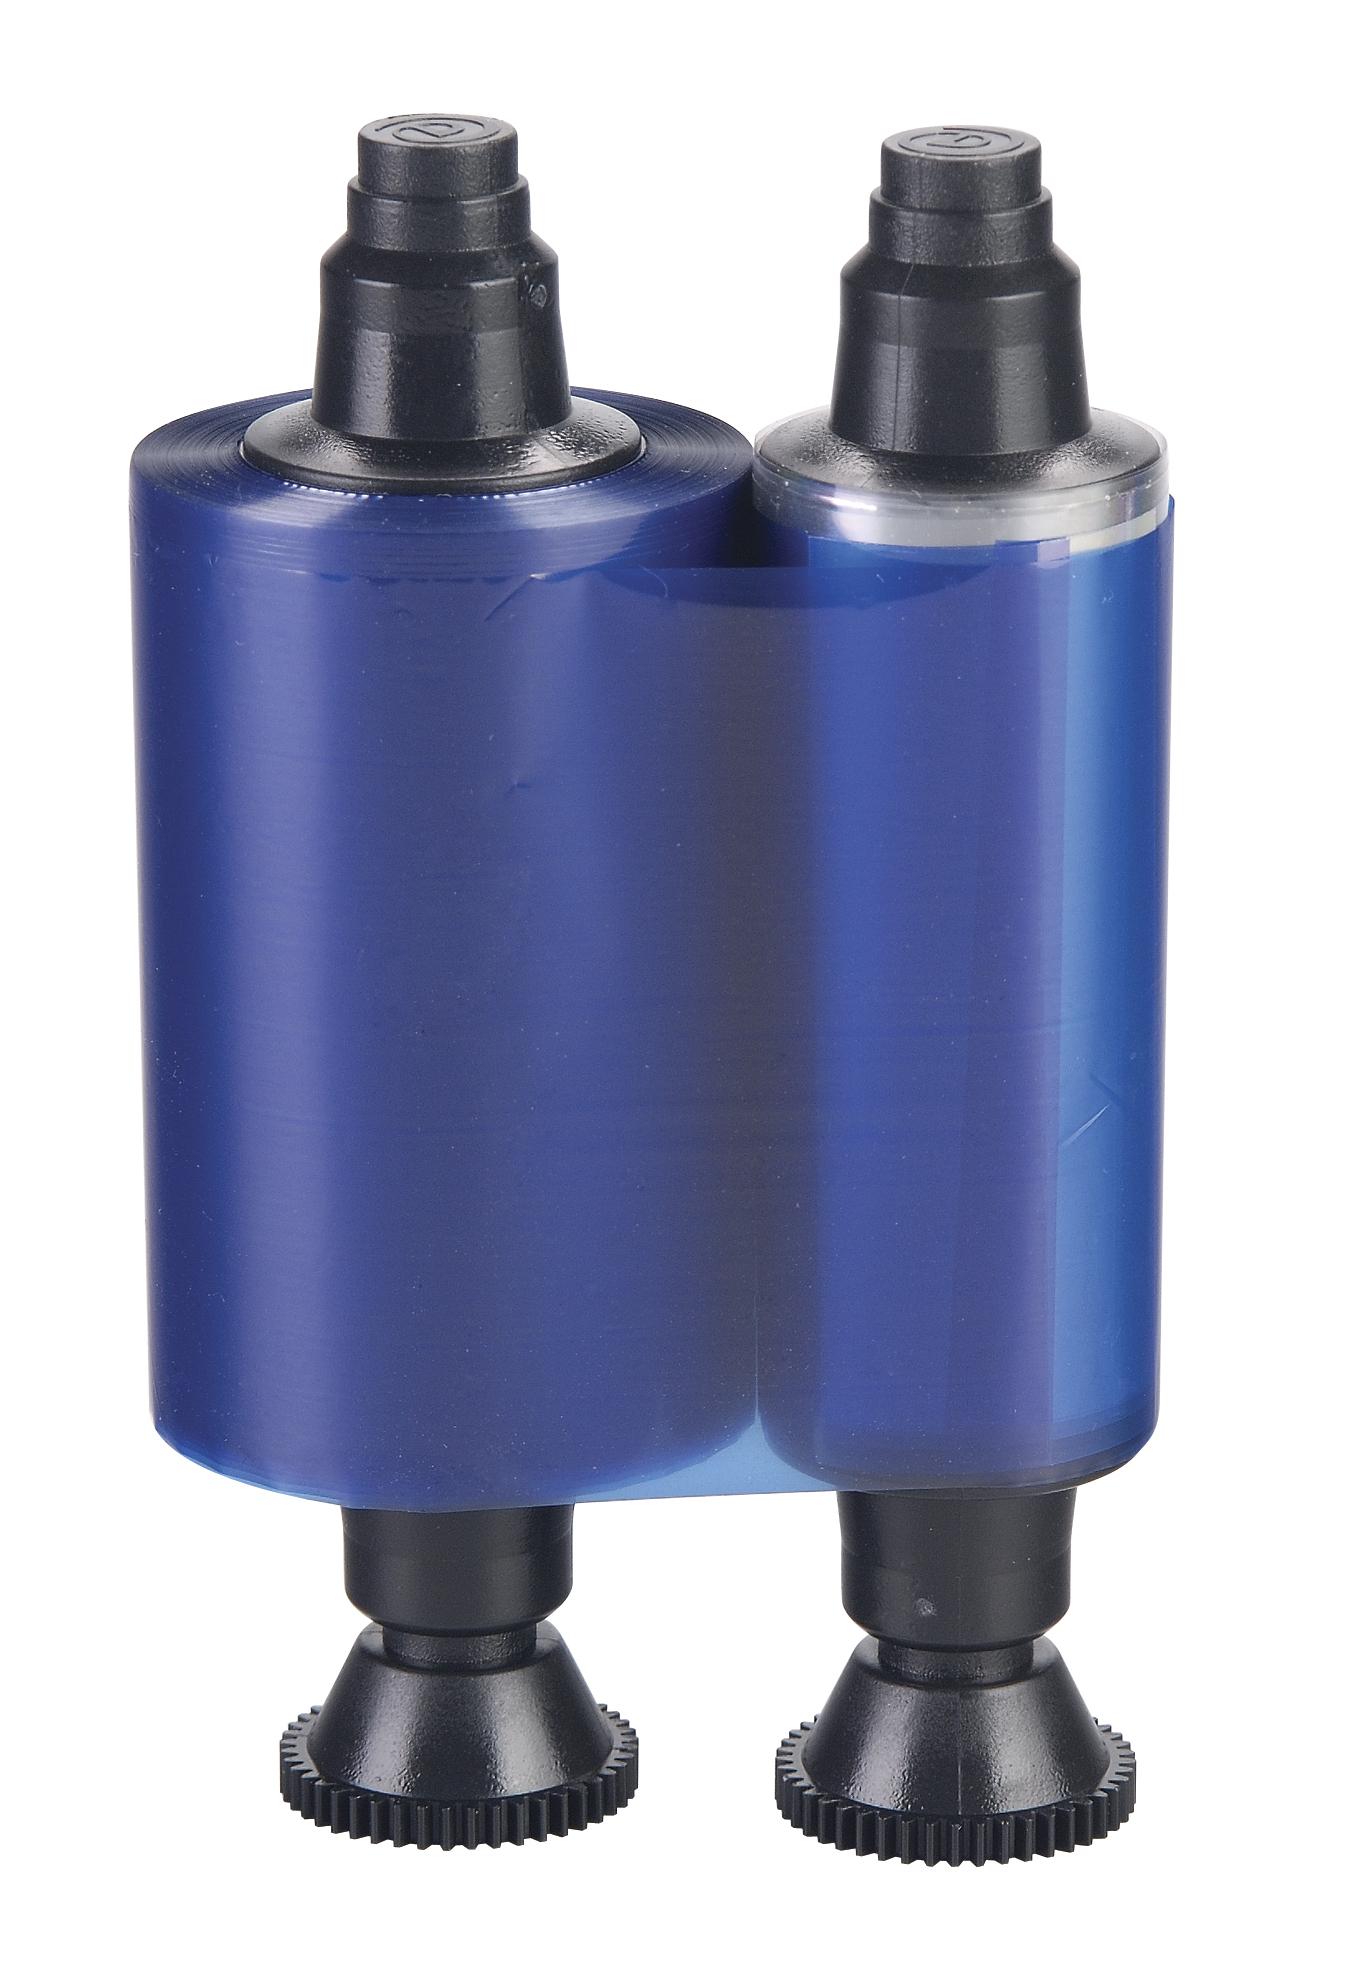 BLUE MONOCHROME RIBBON DUALYS3/PEBBLE4/QUANTUM2/SECURION COMPATIBLE 1000 PRINTS PER ROLL PRICED PER ROLL